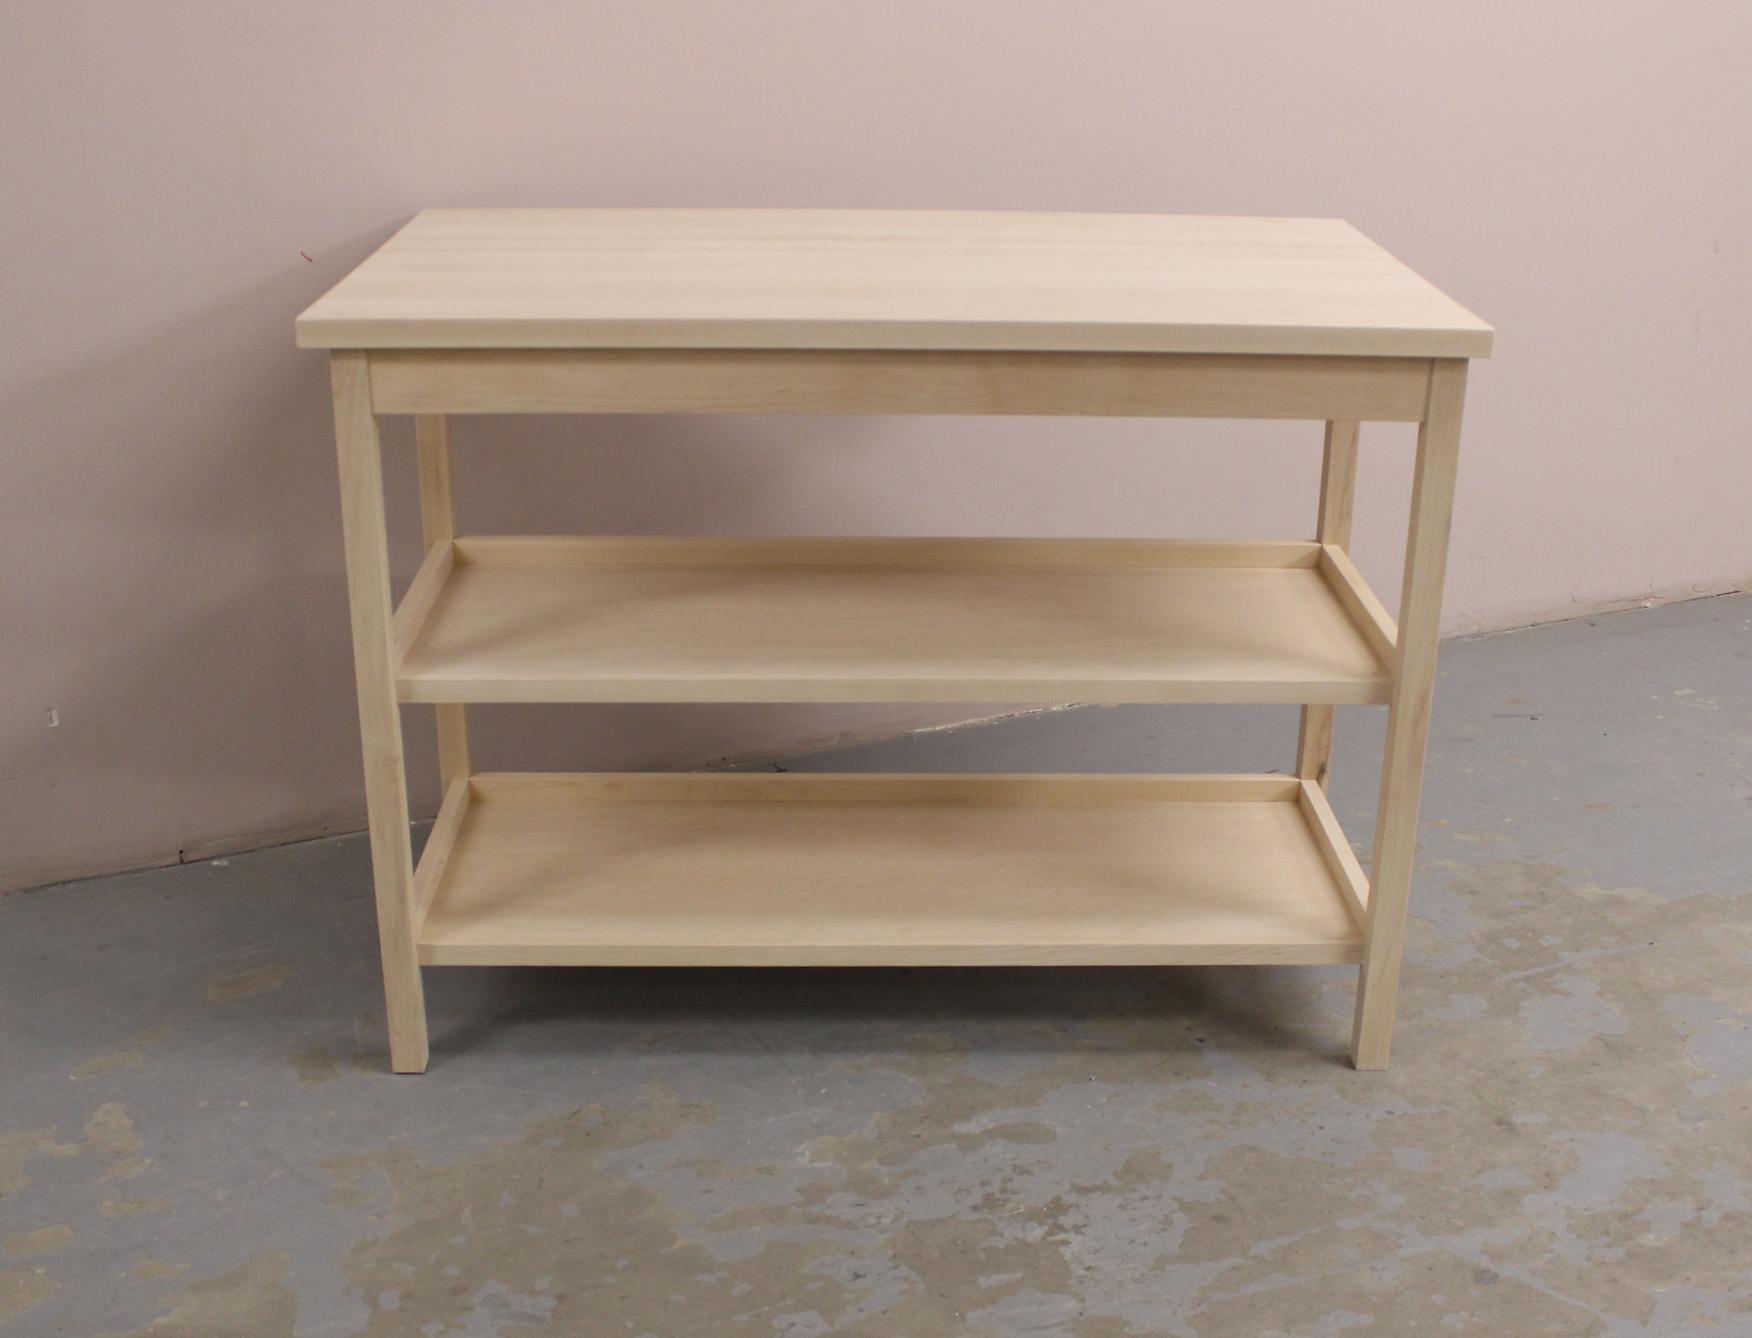 solid wood furniture, made in montreal, îlot de cuisine, meuble sure mesure,Montréal